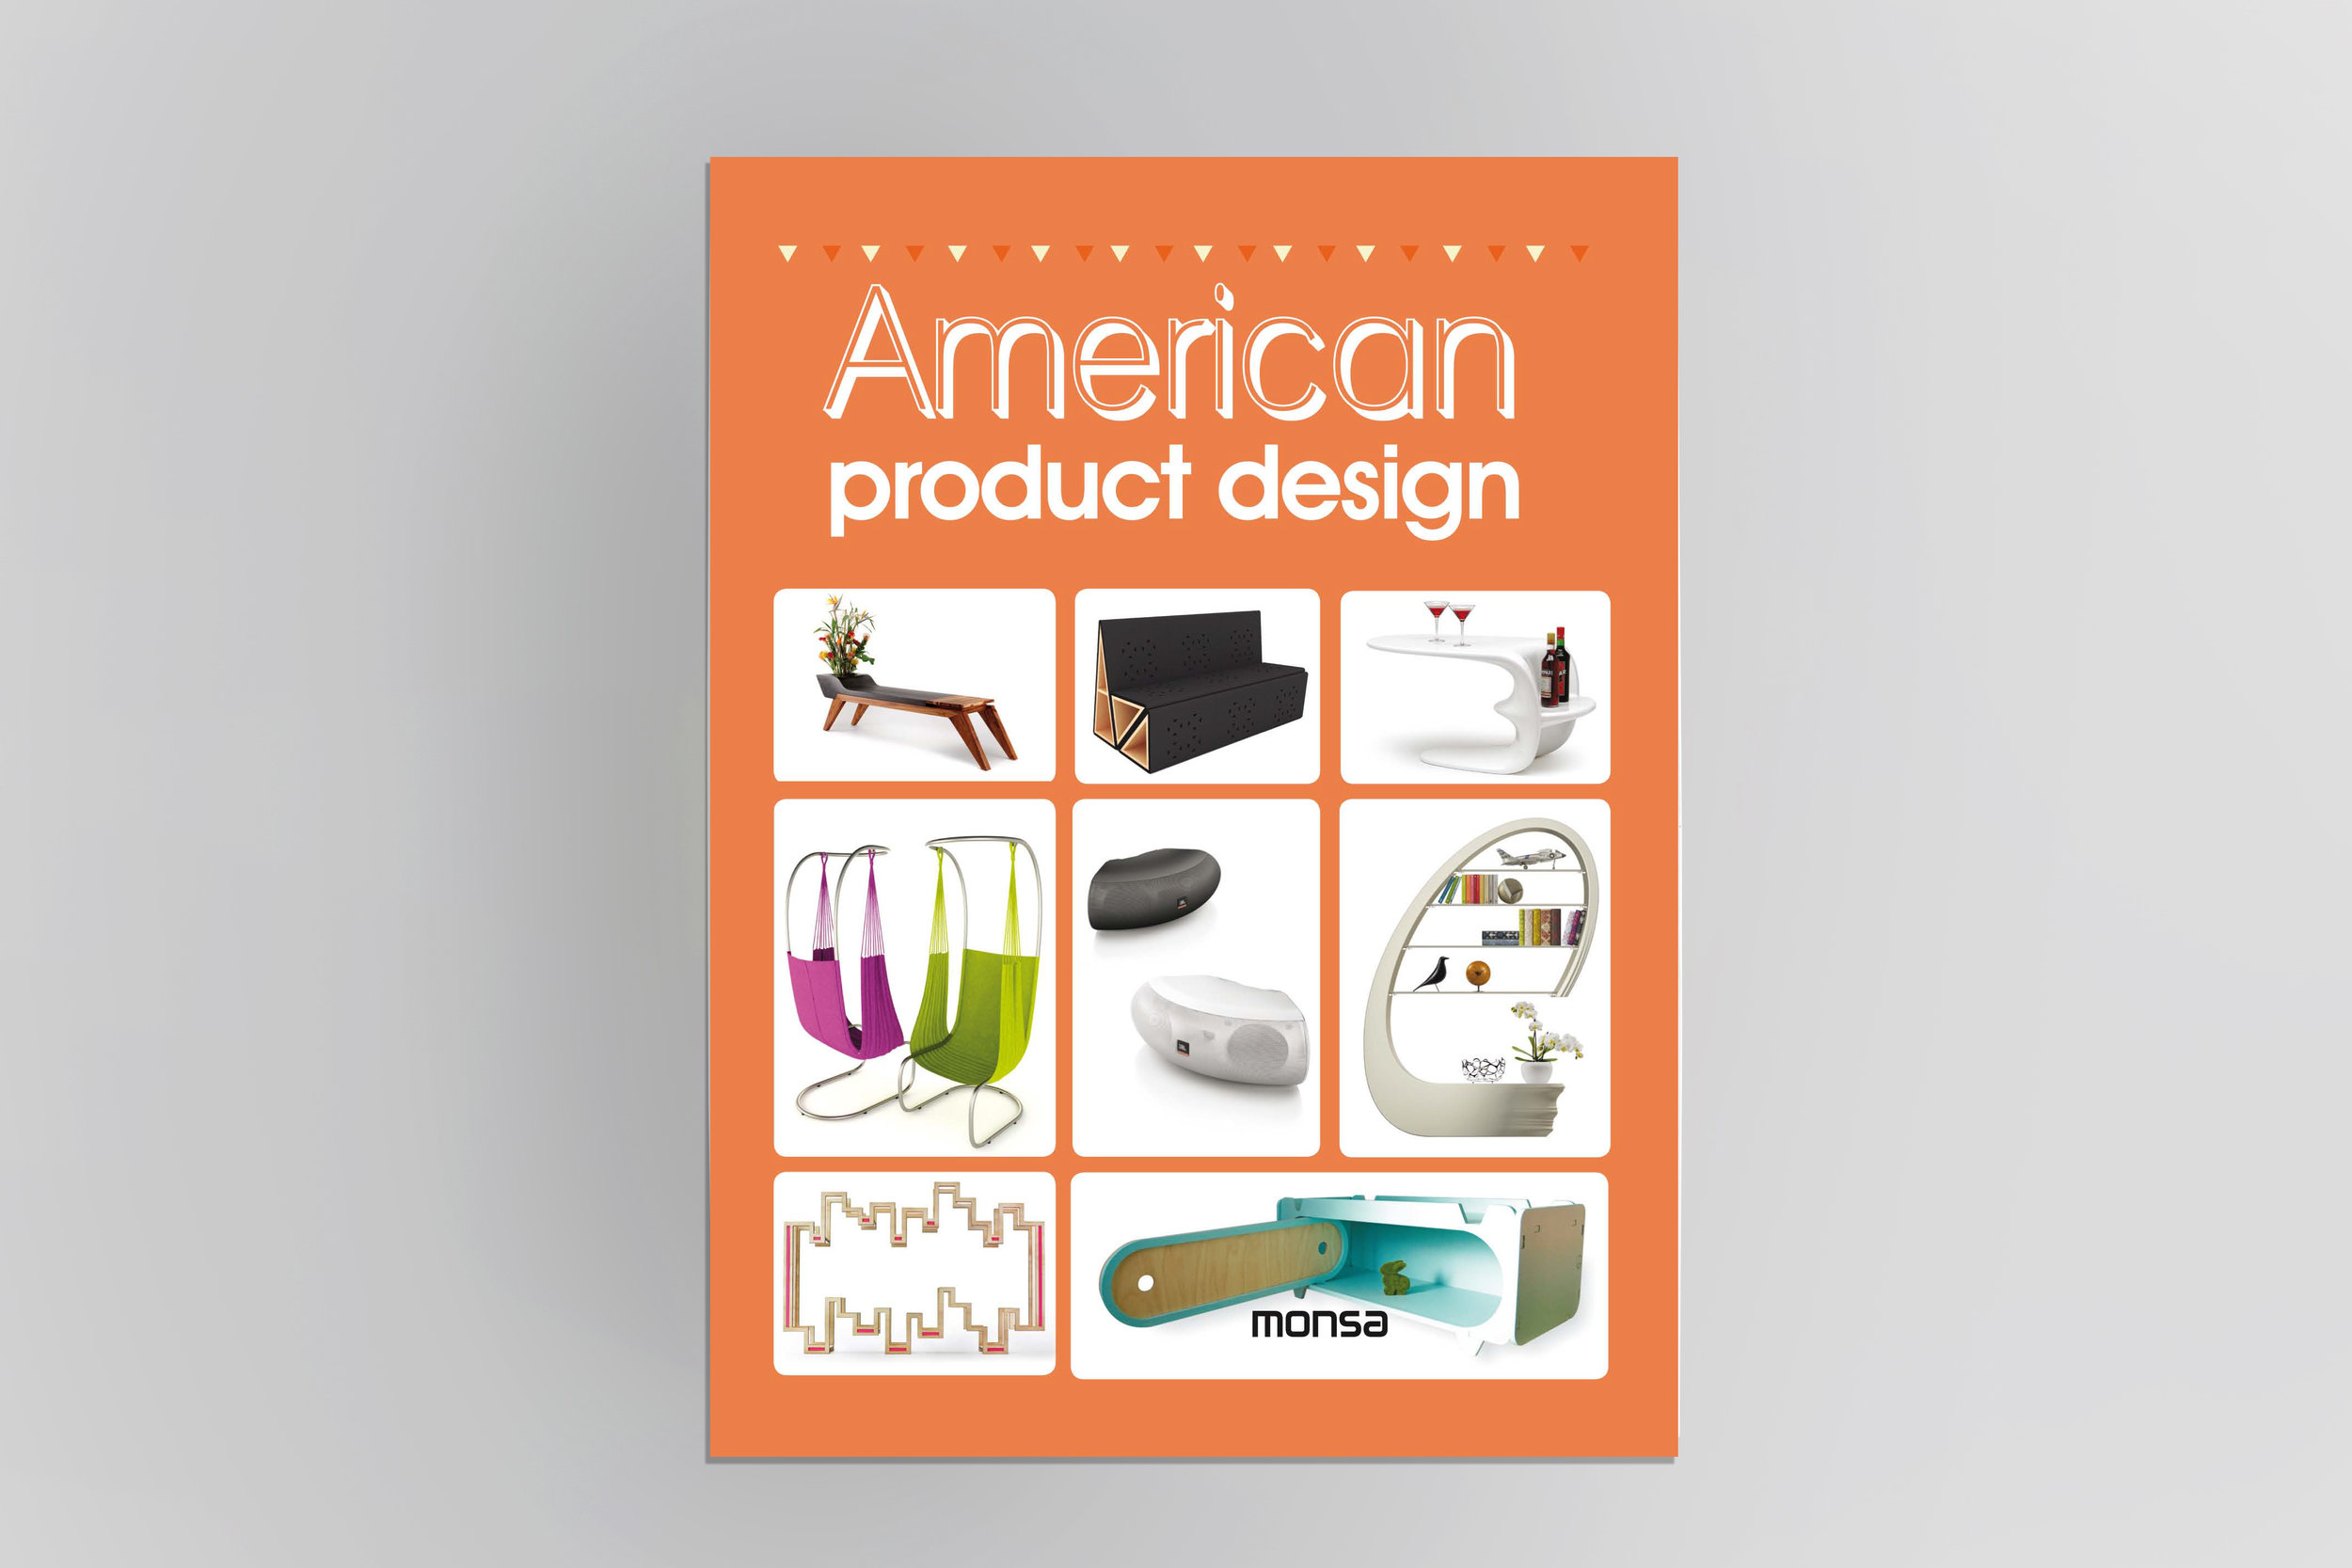 LIBRO  | American Product Design | Autor: Gimenez, Marc; Minguet, Eva; Minguet, Josep Maria | Editorial: Instituto Monsa De Ediciones | Spain | 2016